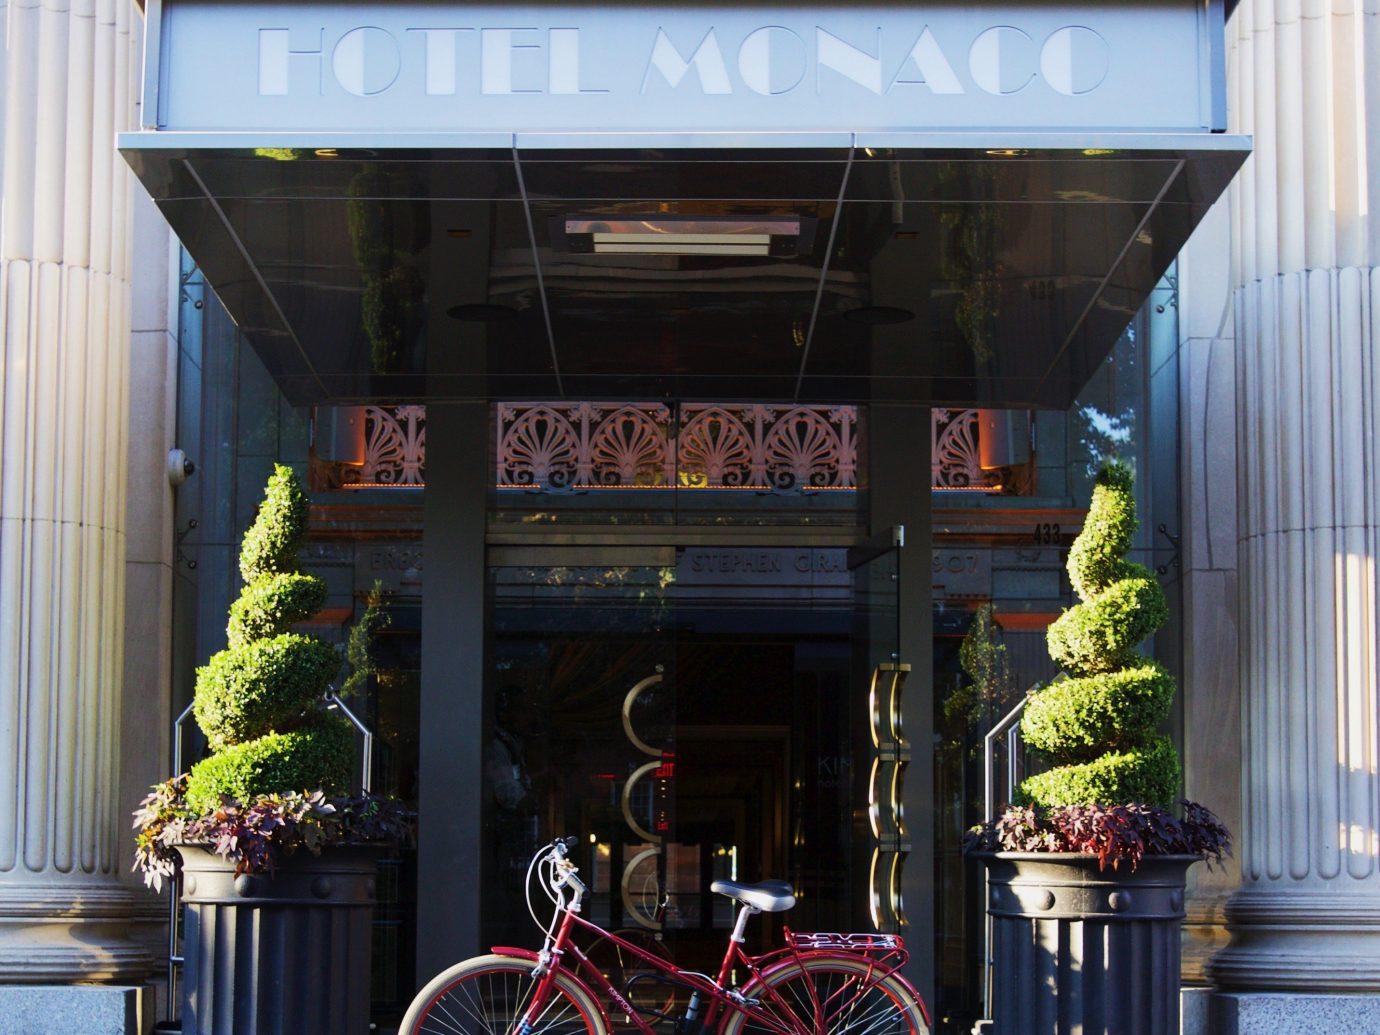 Boutique Hotels Hotels Philadelphia vehicle facade window street City building